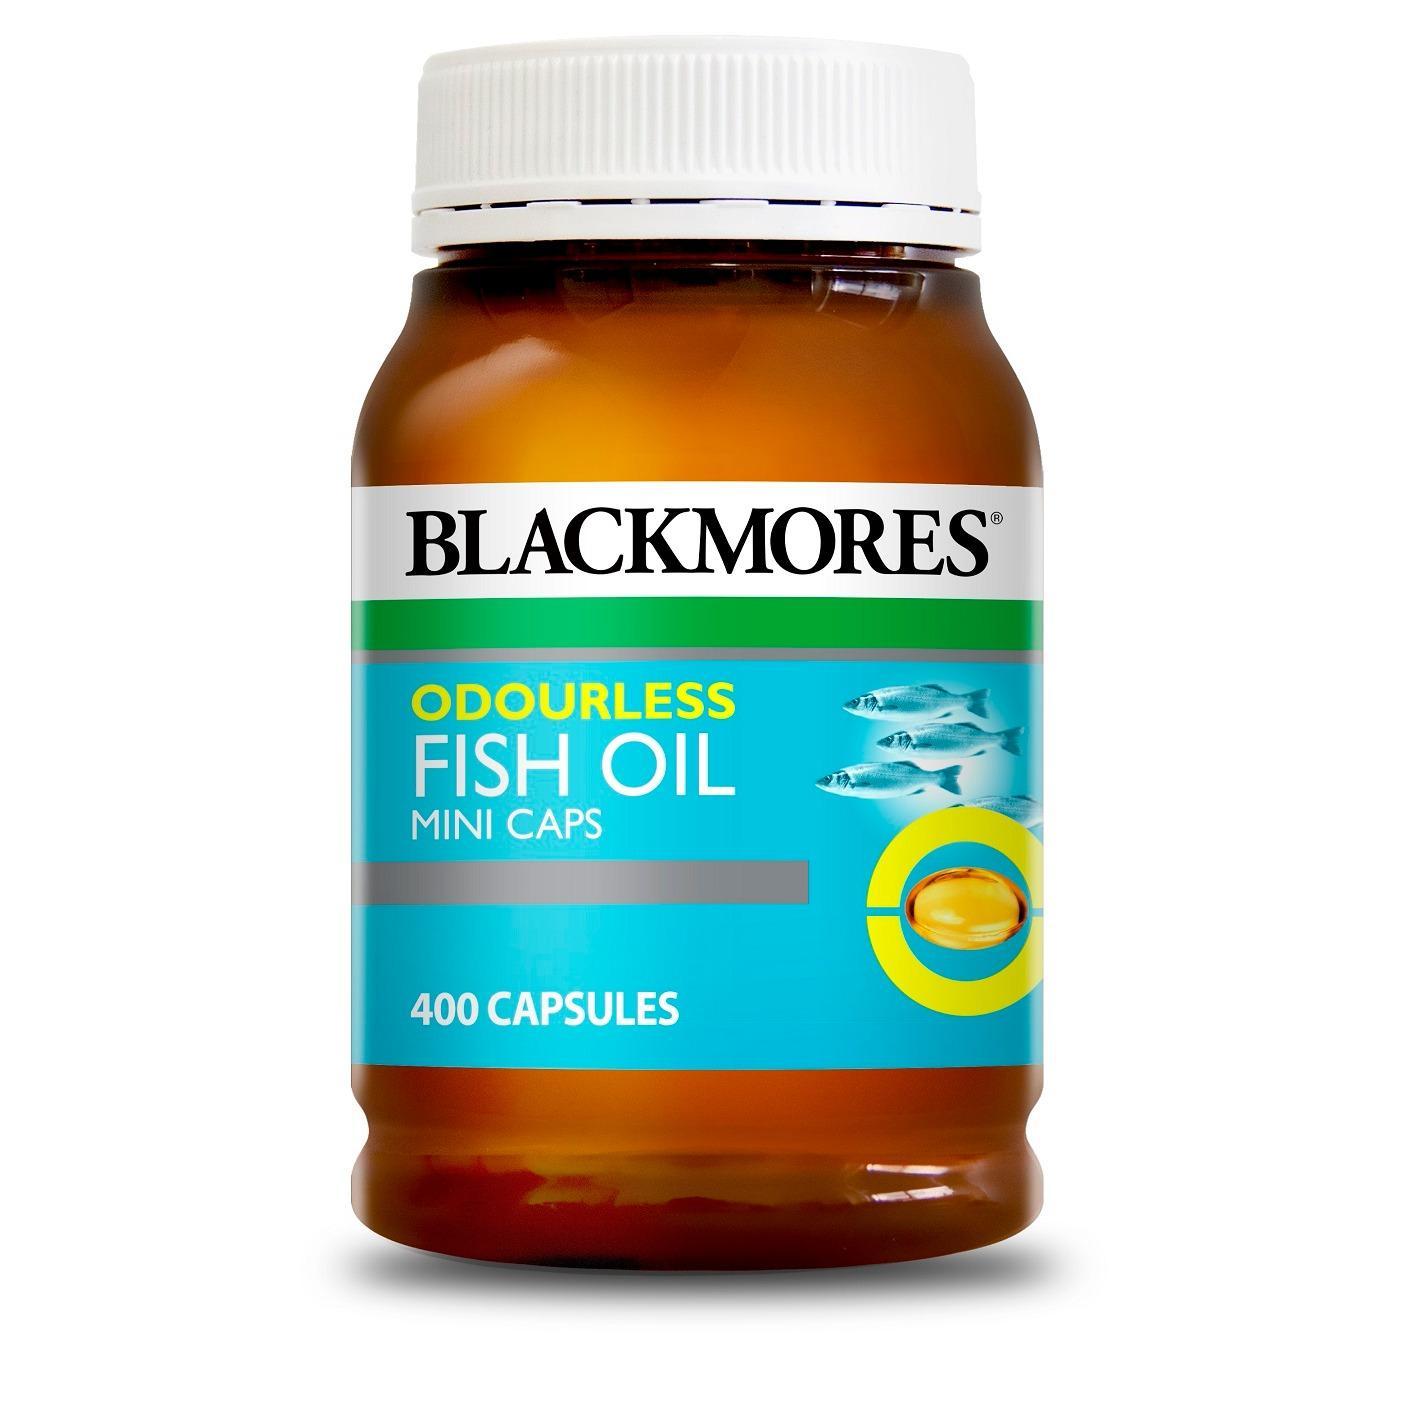 Blackmores Odourless Fish Oil 400 Mini Capsules Deal